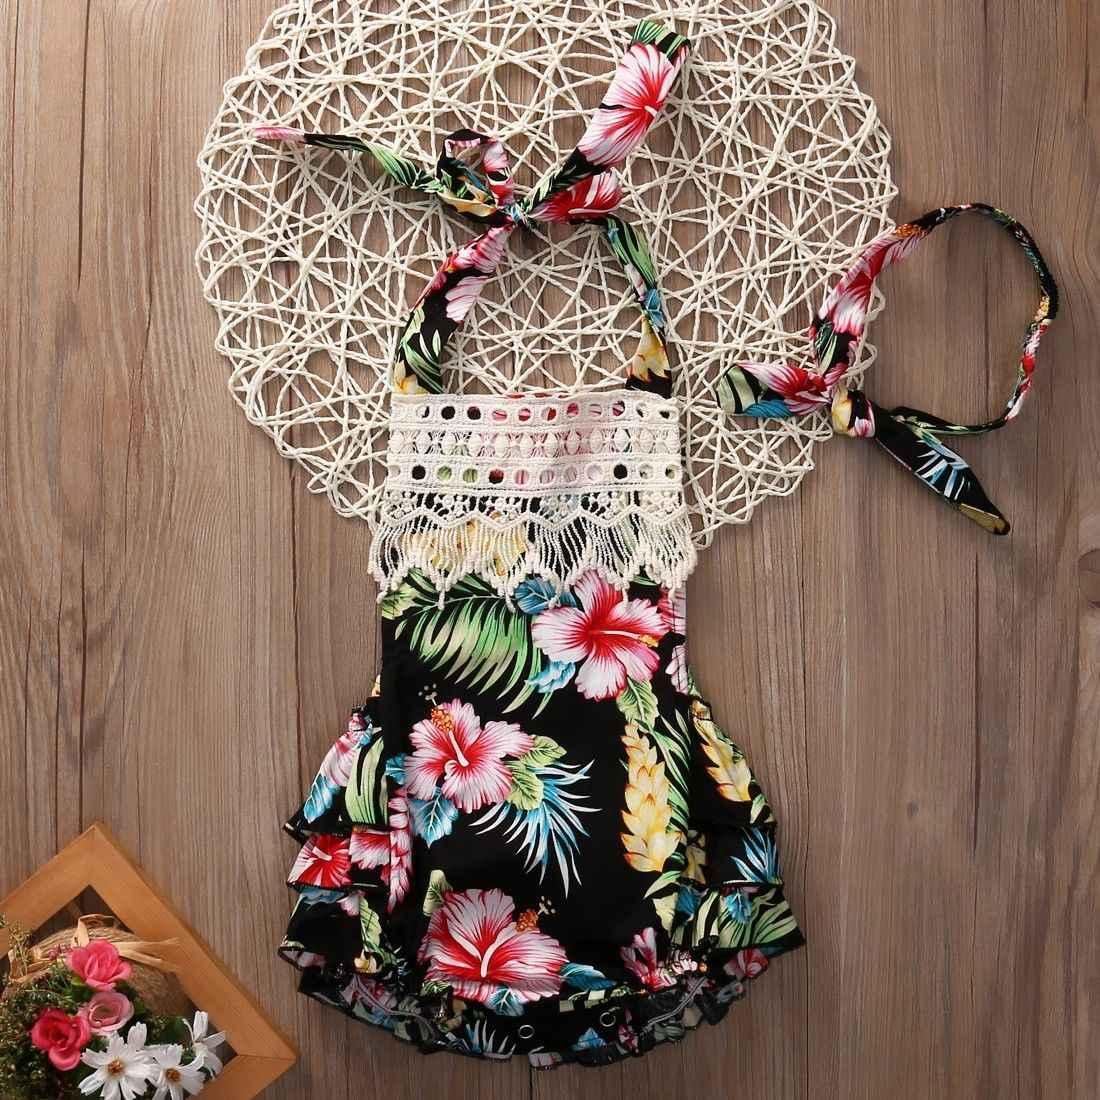 f16ab4fedba7c 2017 Floral Baby Girl Clothes Summer Sleeveless Flower Romper Bodysuit  Ruffles Halter Jumpsuit +Headband 2PCS Outfits Sunsuit